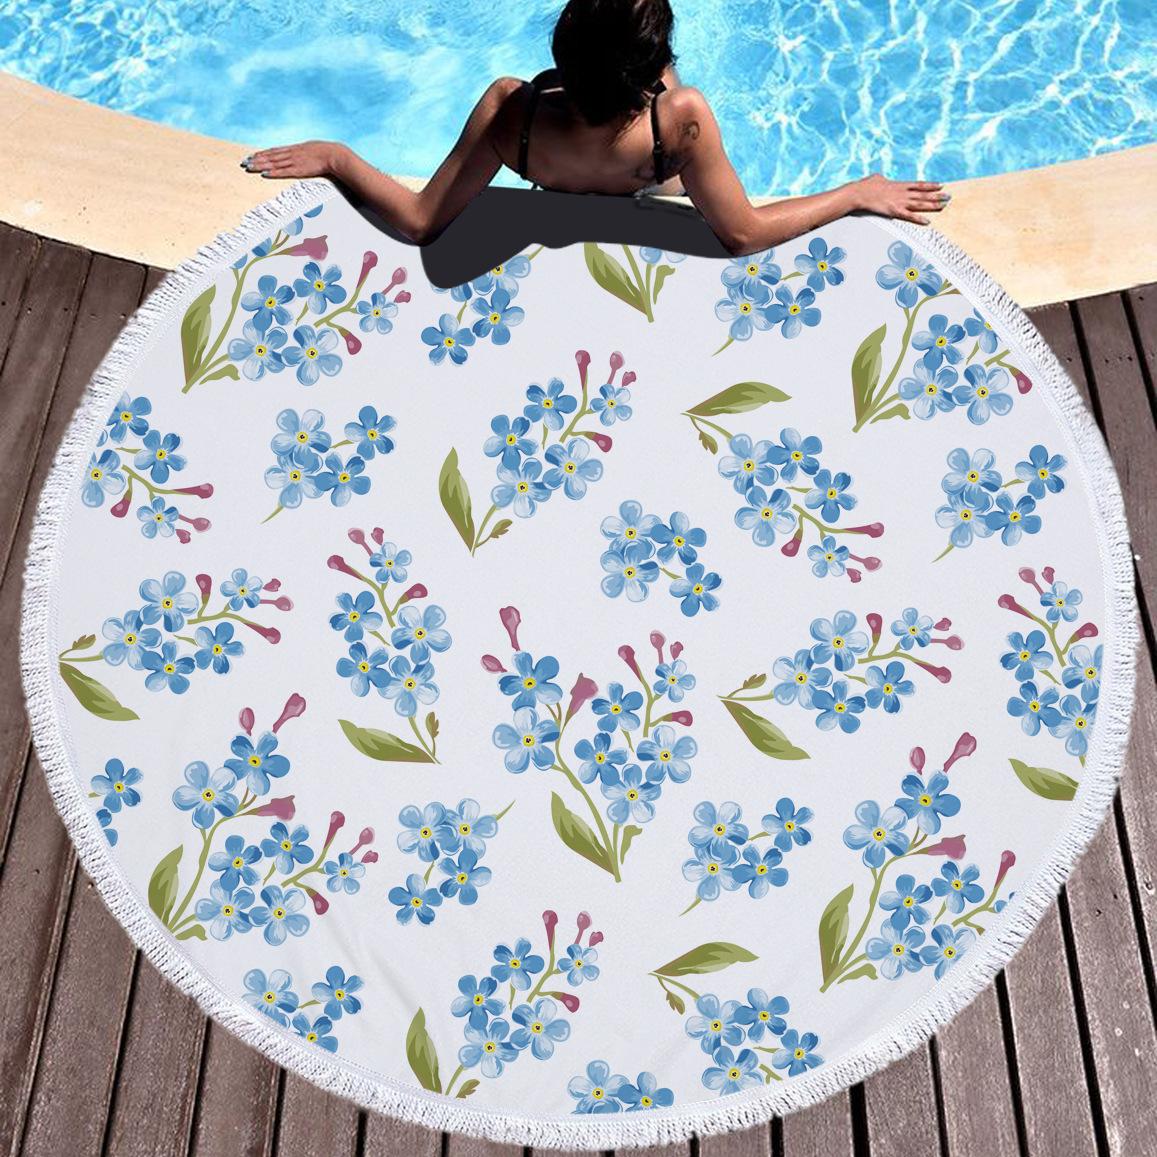 White Bouquet roxo Impresso microfibra Rodada Toalhas de praia toalha de banho para adultos dos miúdos Mat Yoga borlas Blanket Home Decor